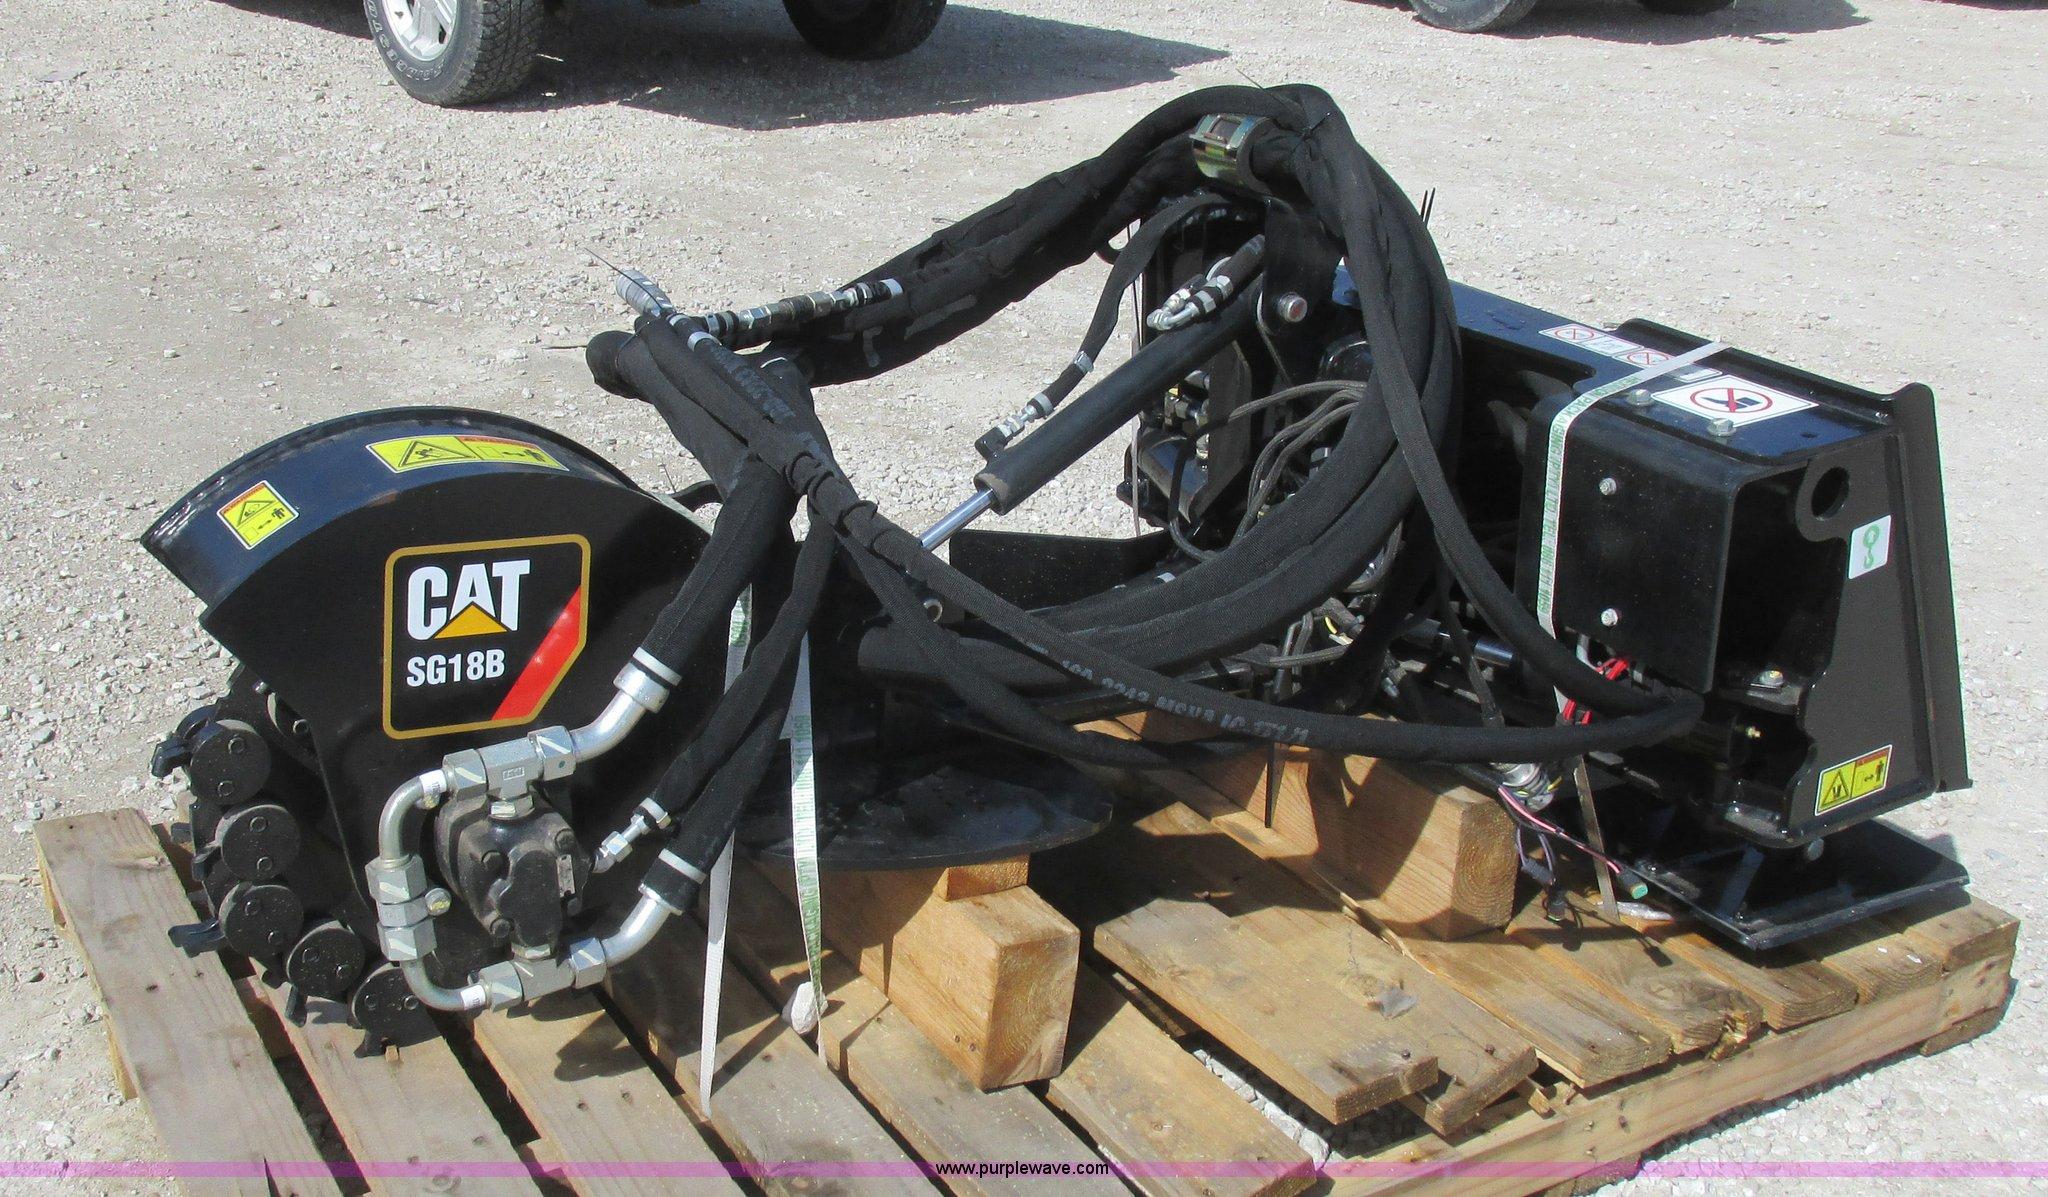 Caterpillar Sg18b Skid Steer Stump Grinder Item L7155 So